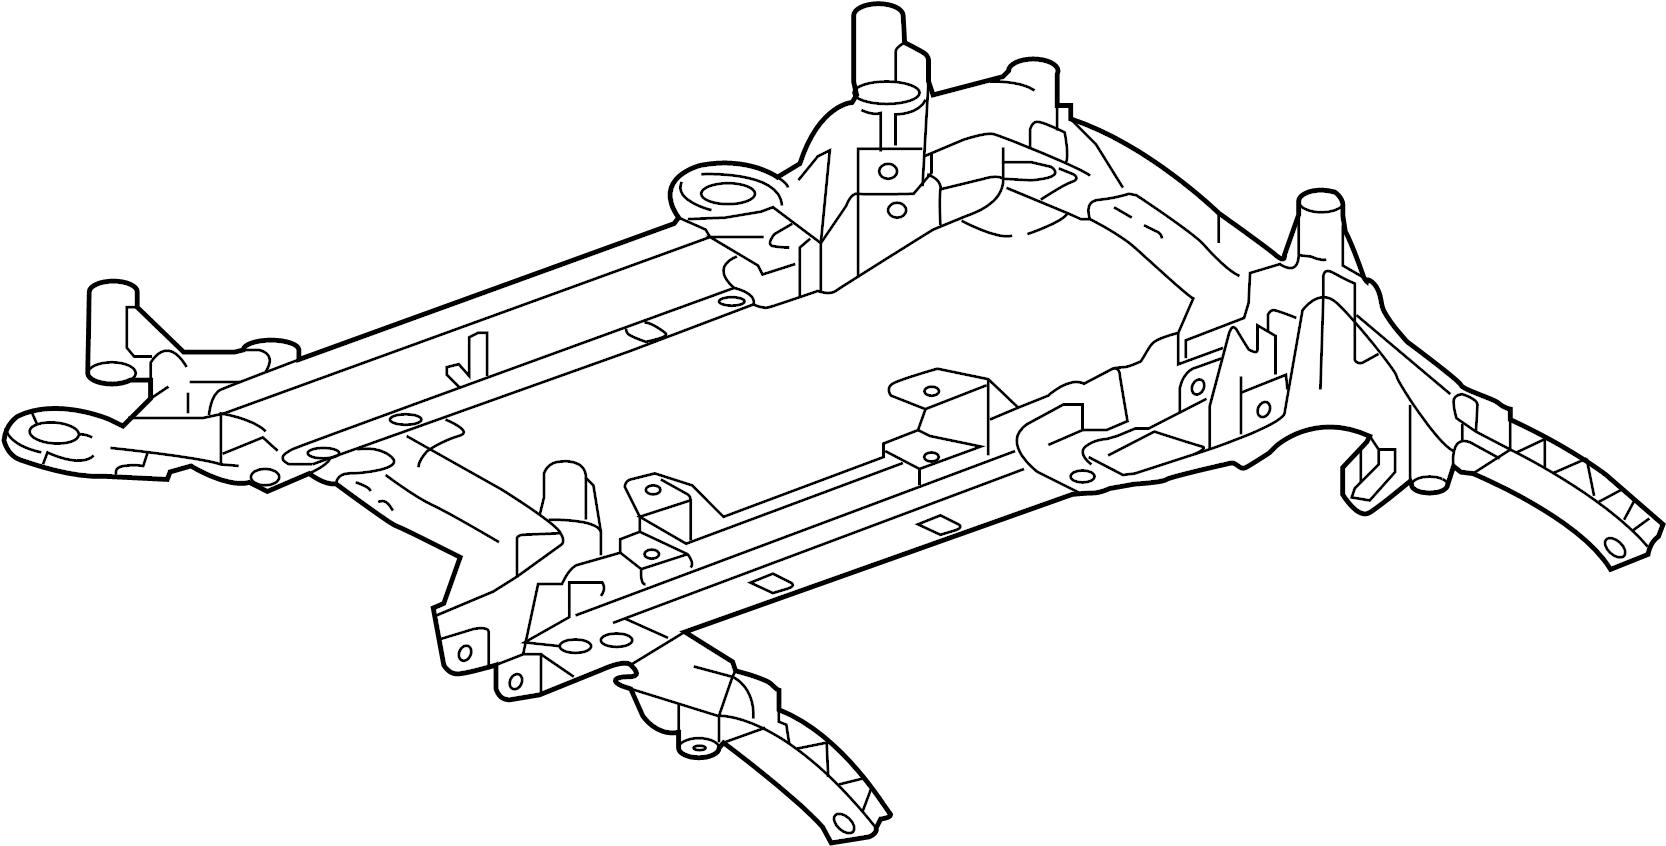 [DIAGRAM] Lincoln Ls 2002 30 V 6 Engine Diagram FULL